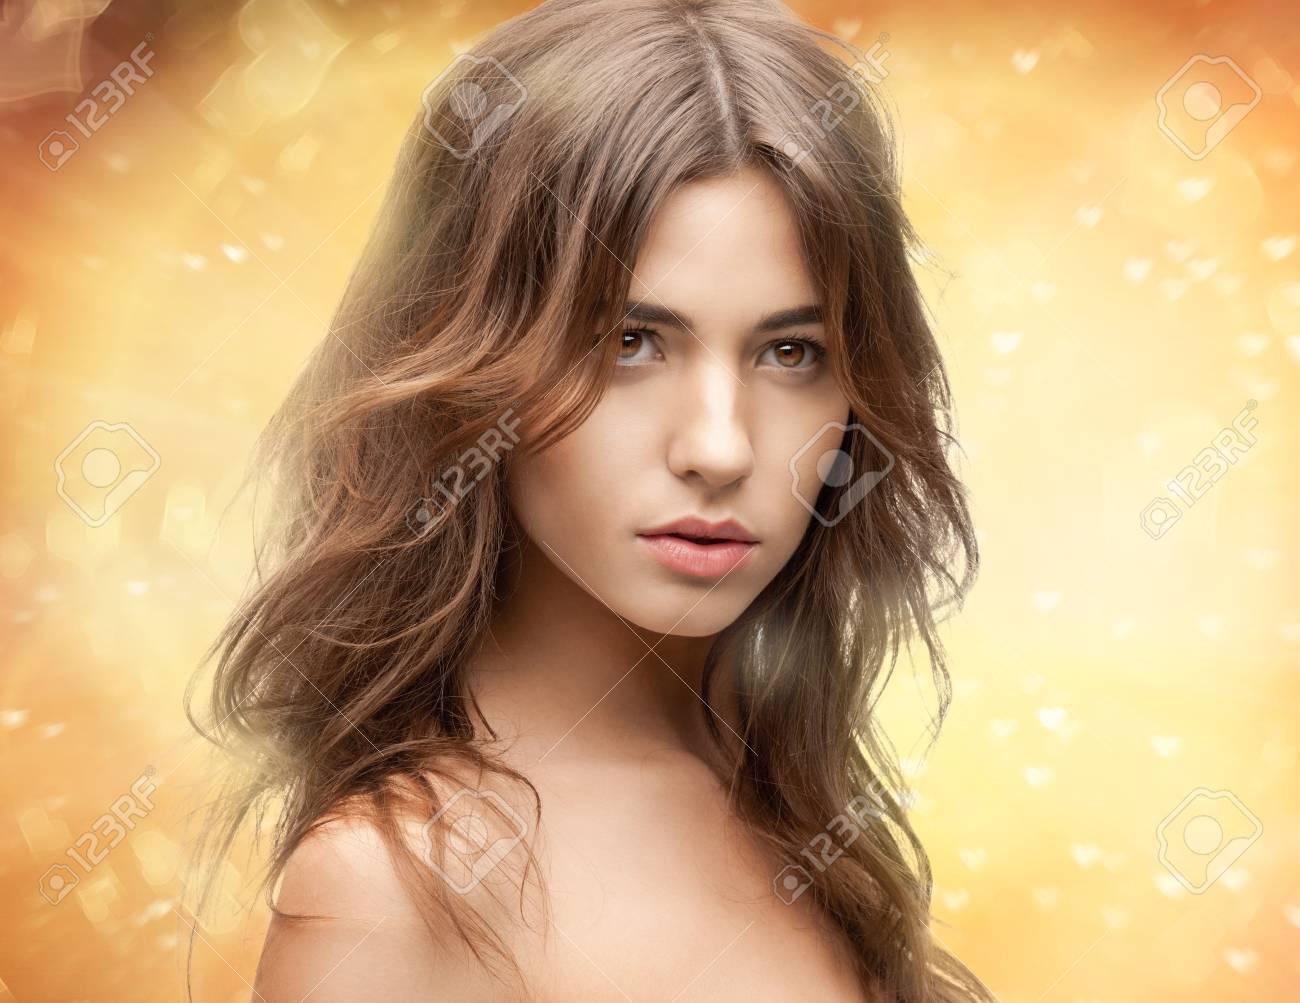 bright closeup portrait picture of beautiful woman Stock Photo - 16606089